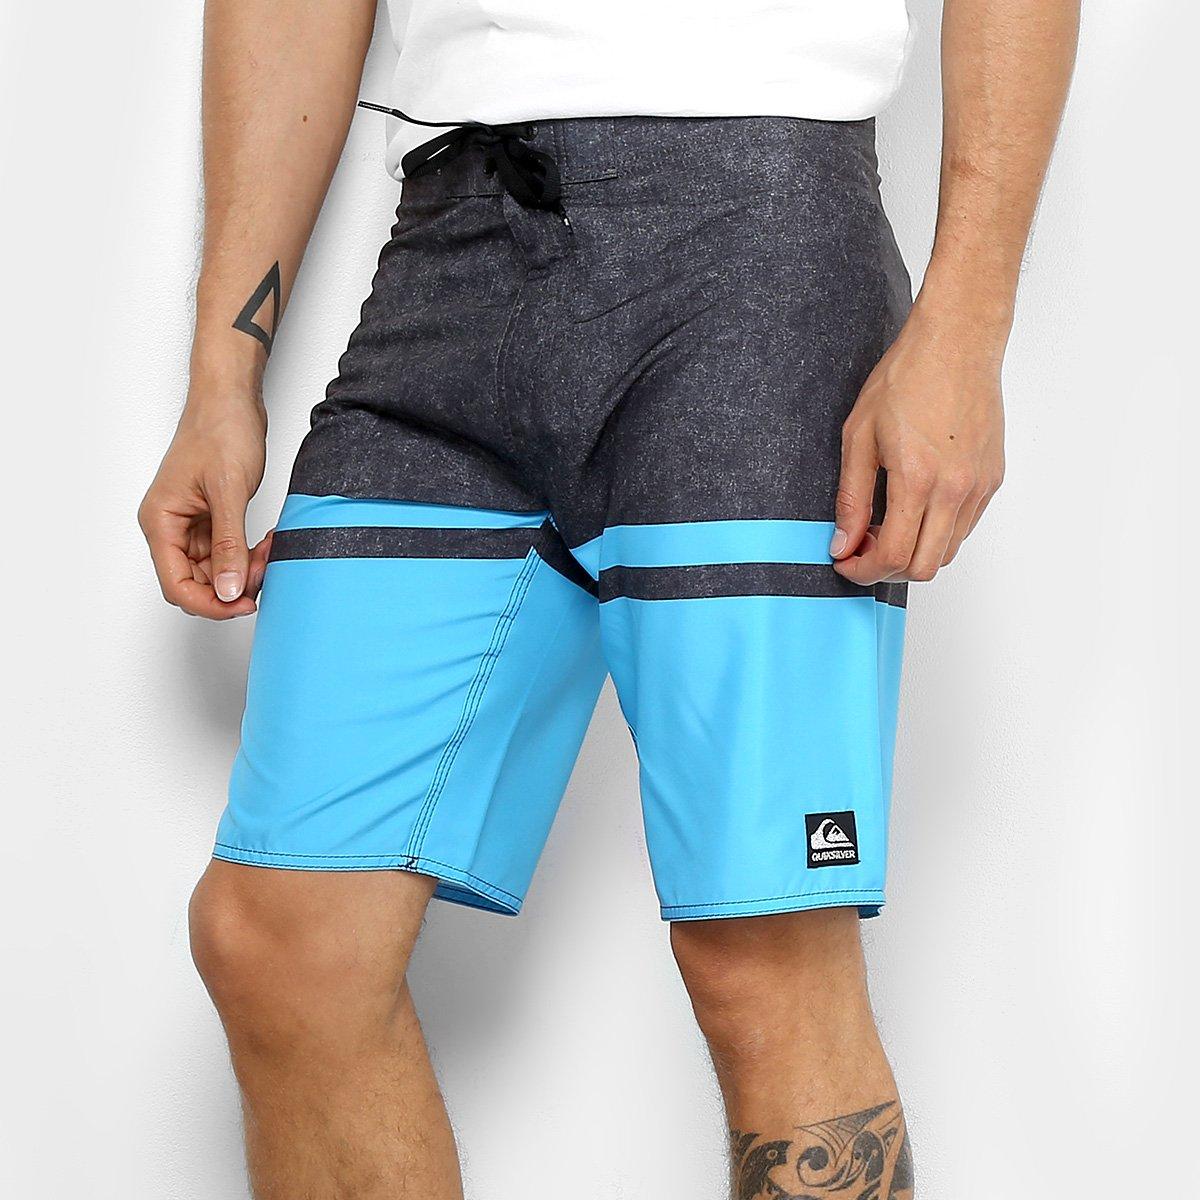 Boardshort Quiksilver Stomp Masculino - Azul Turquesa - Compre Agora ... e67805dbbc